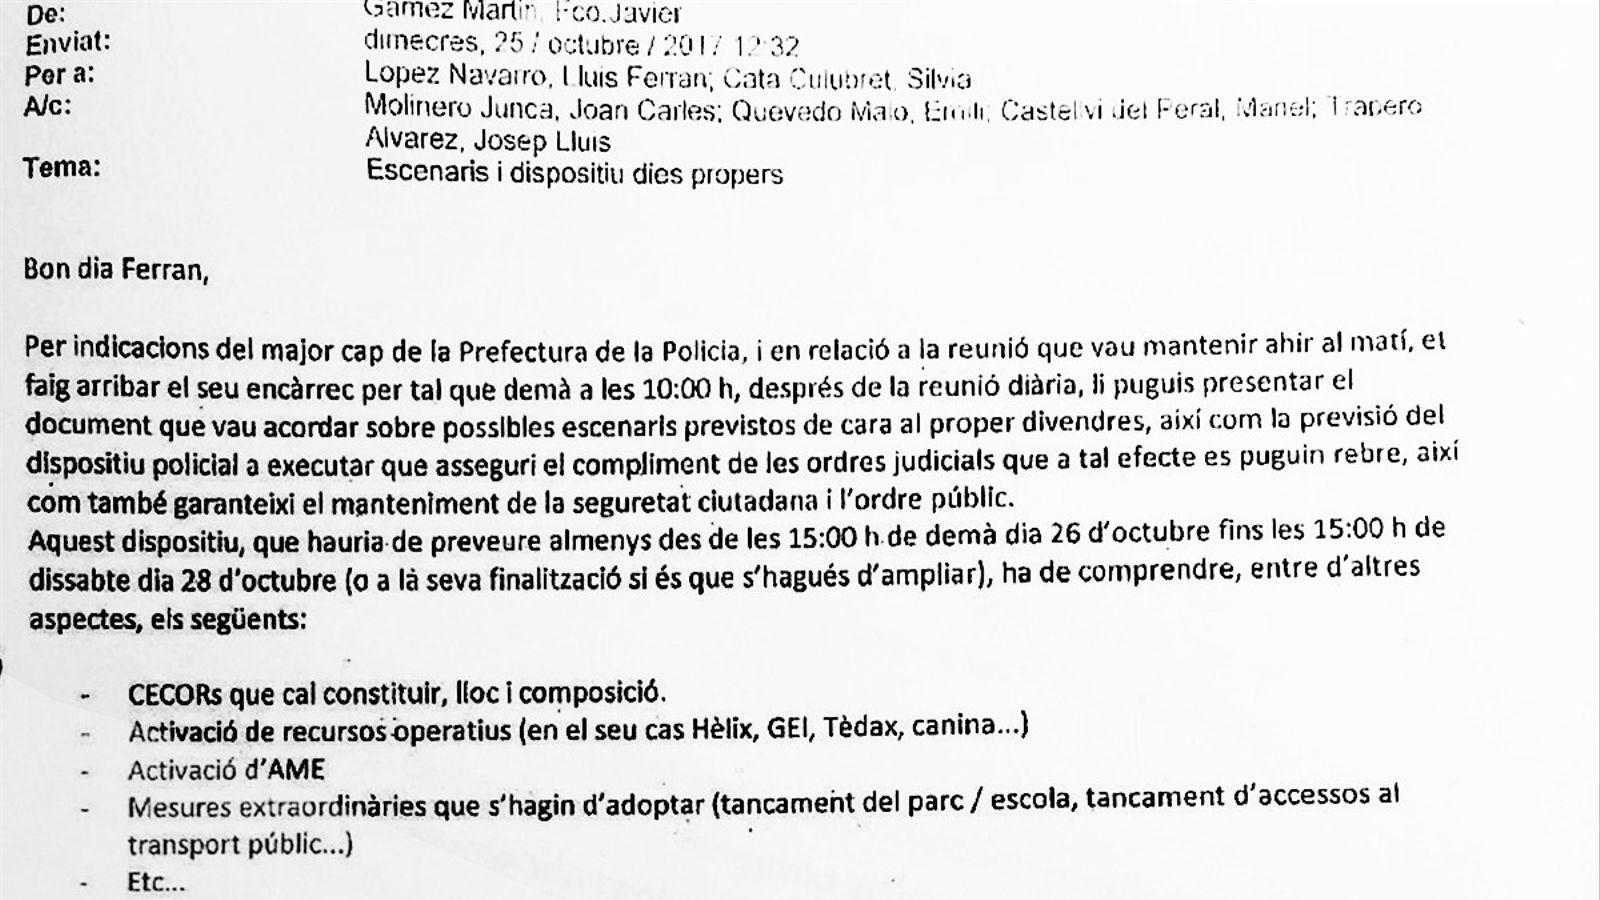 Imagen del correo enviado a Ferran López el 25 de octubre sobre el plan para detener a Puigdemont